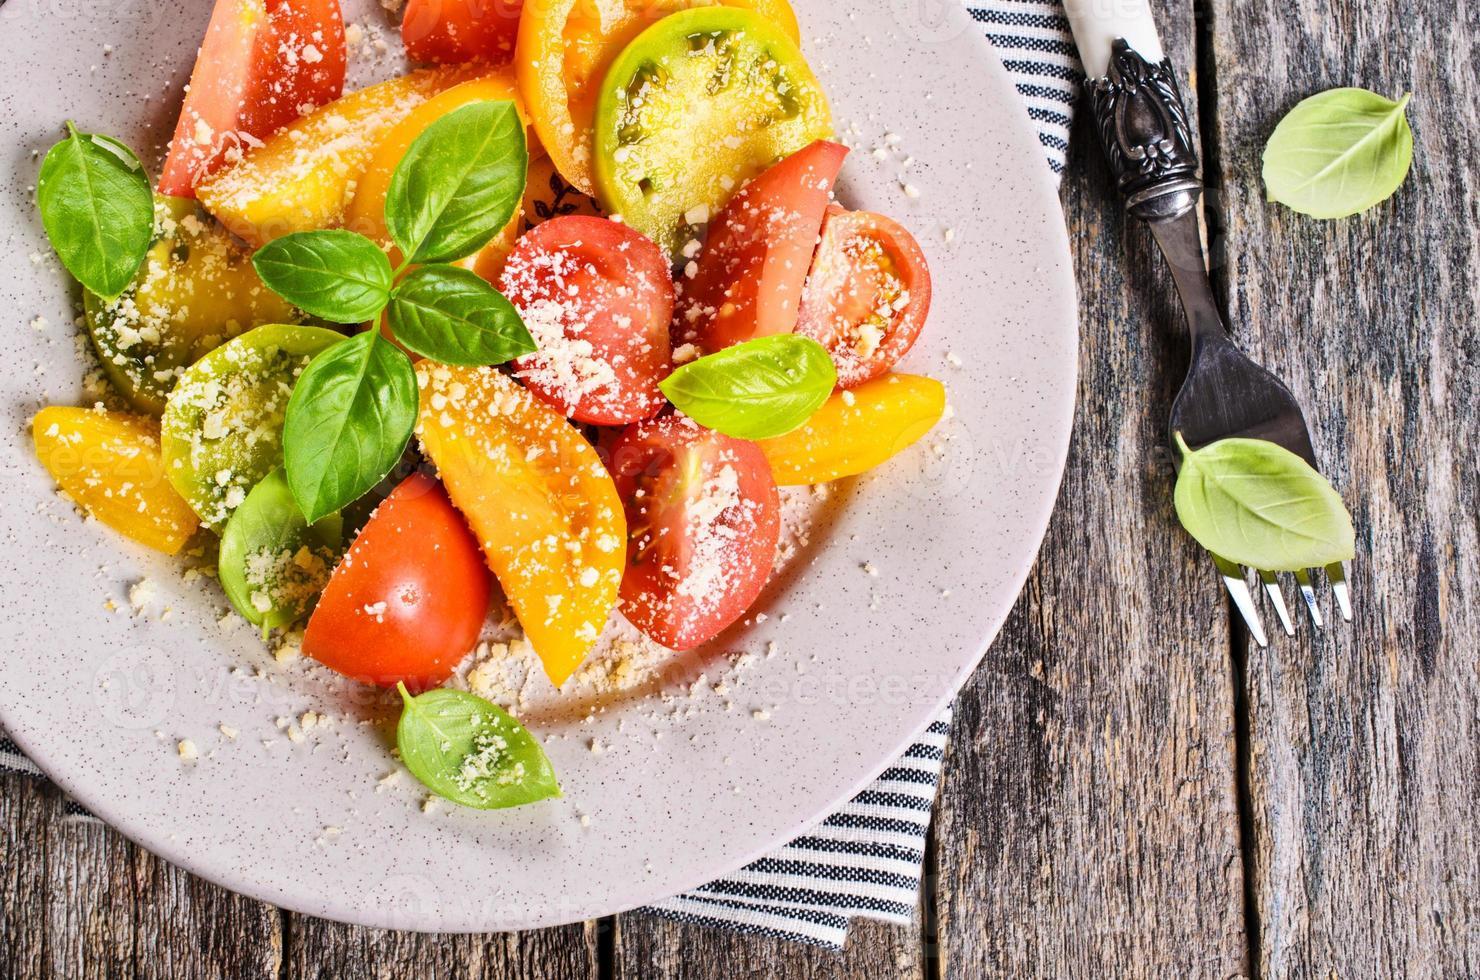 Salad of tomato photo